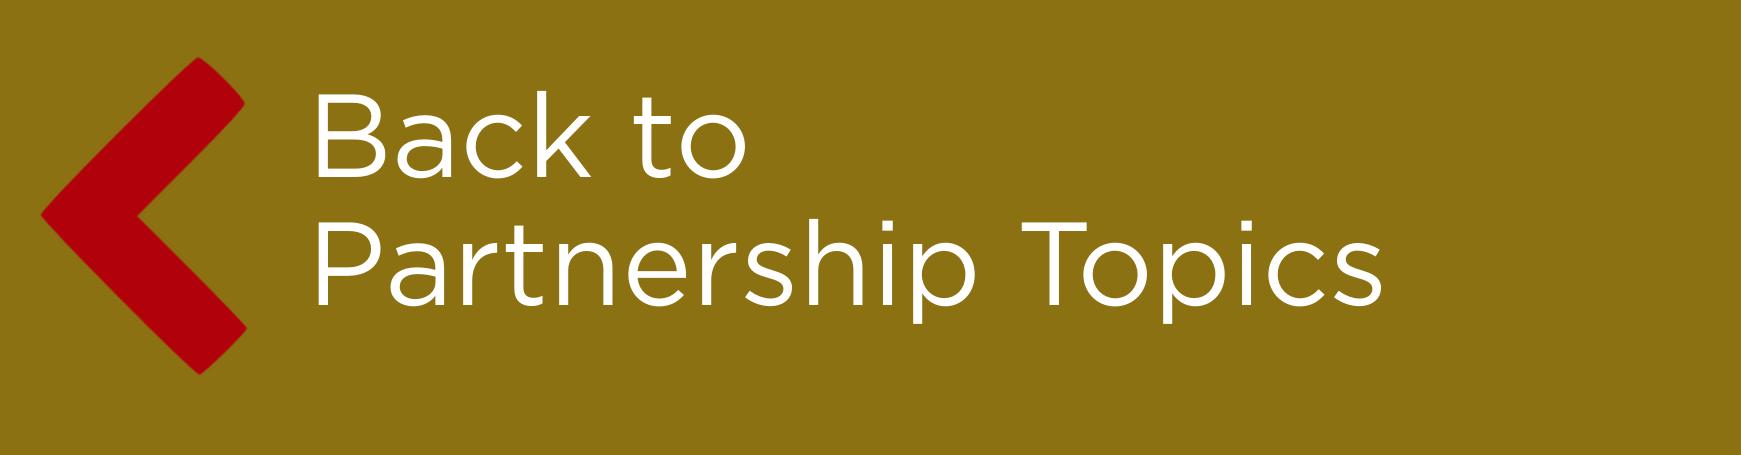 Back to Partnership Topics button